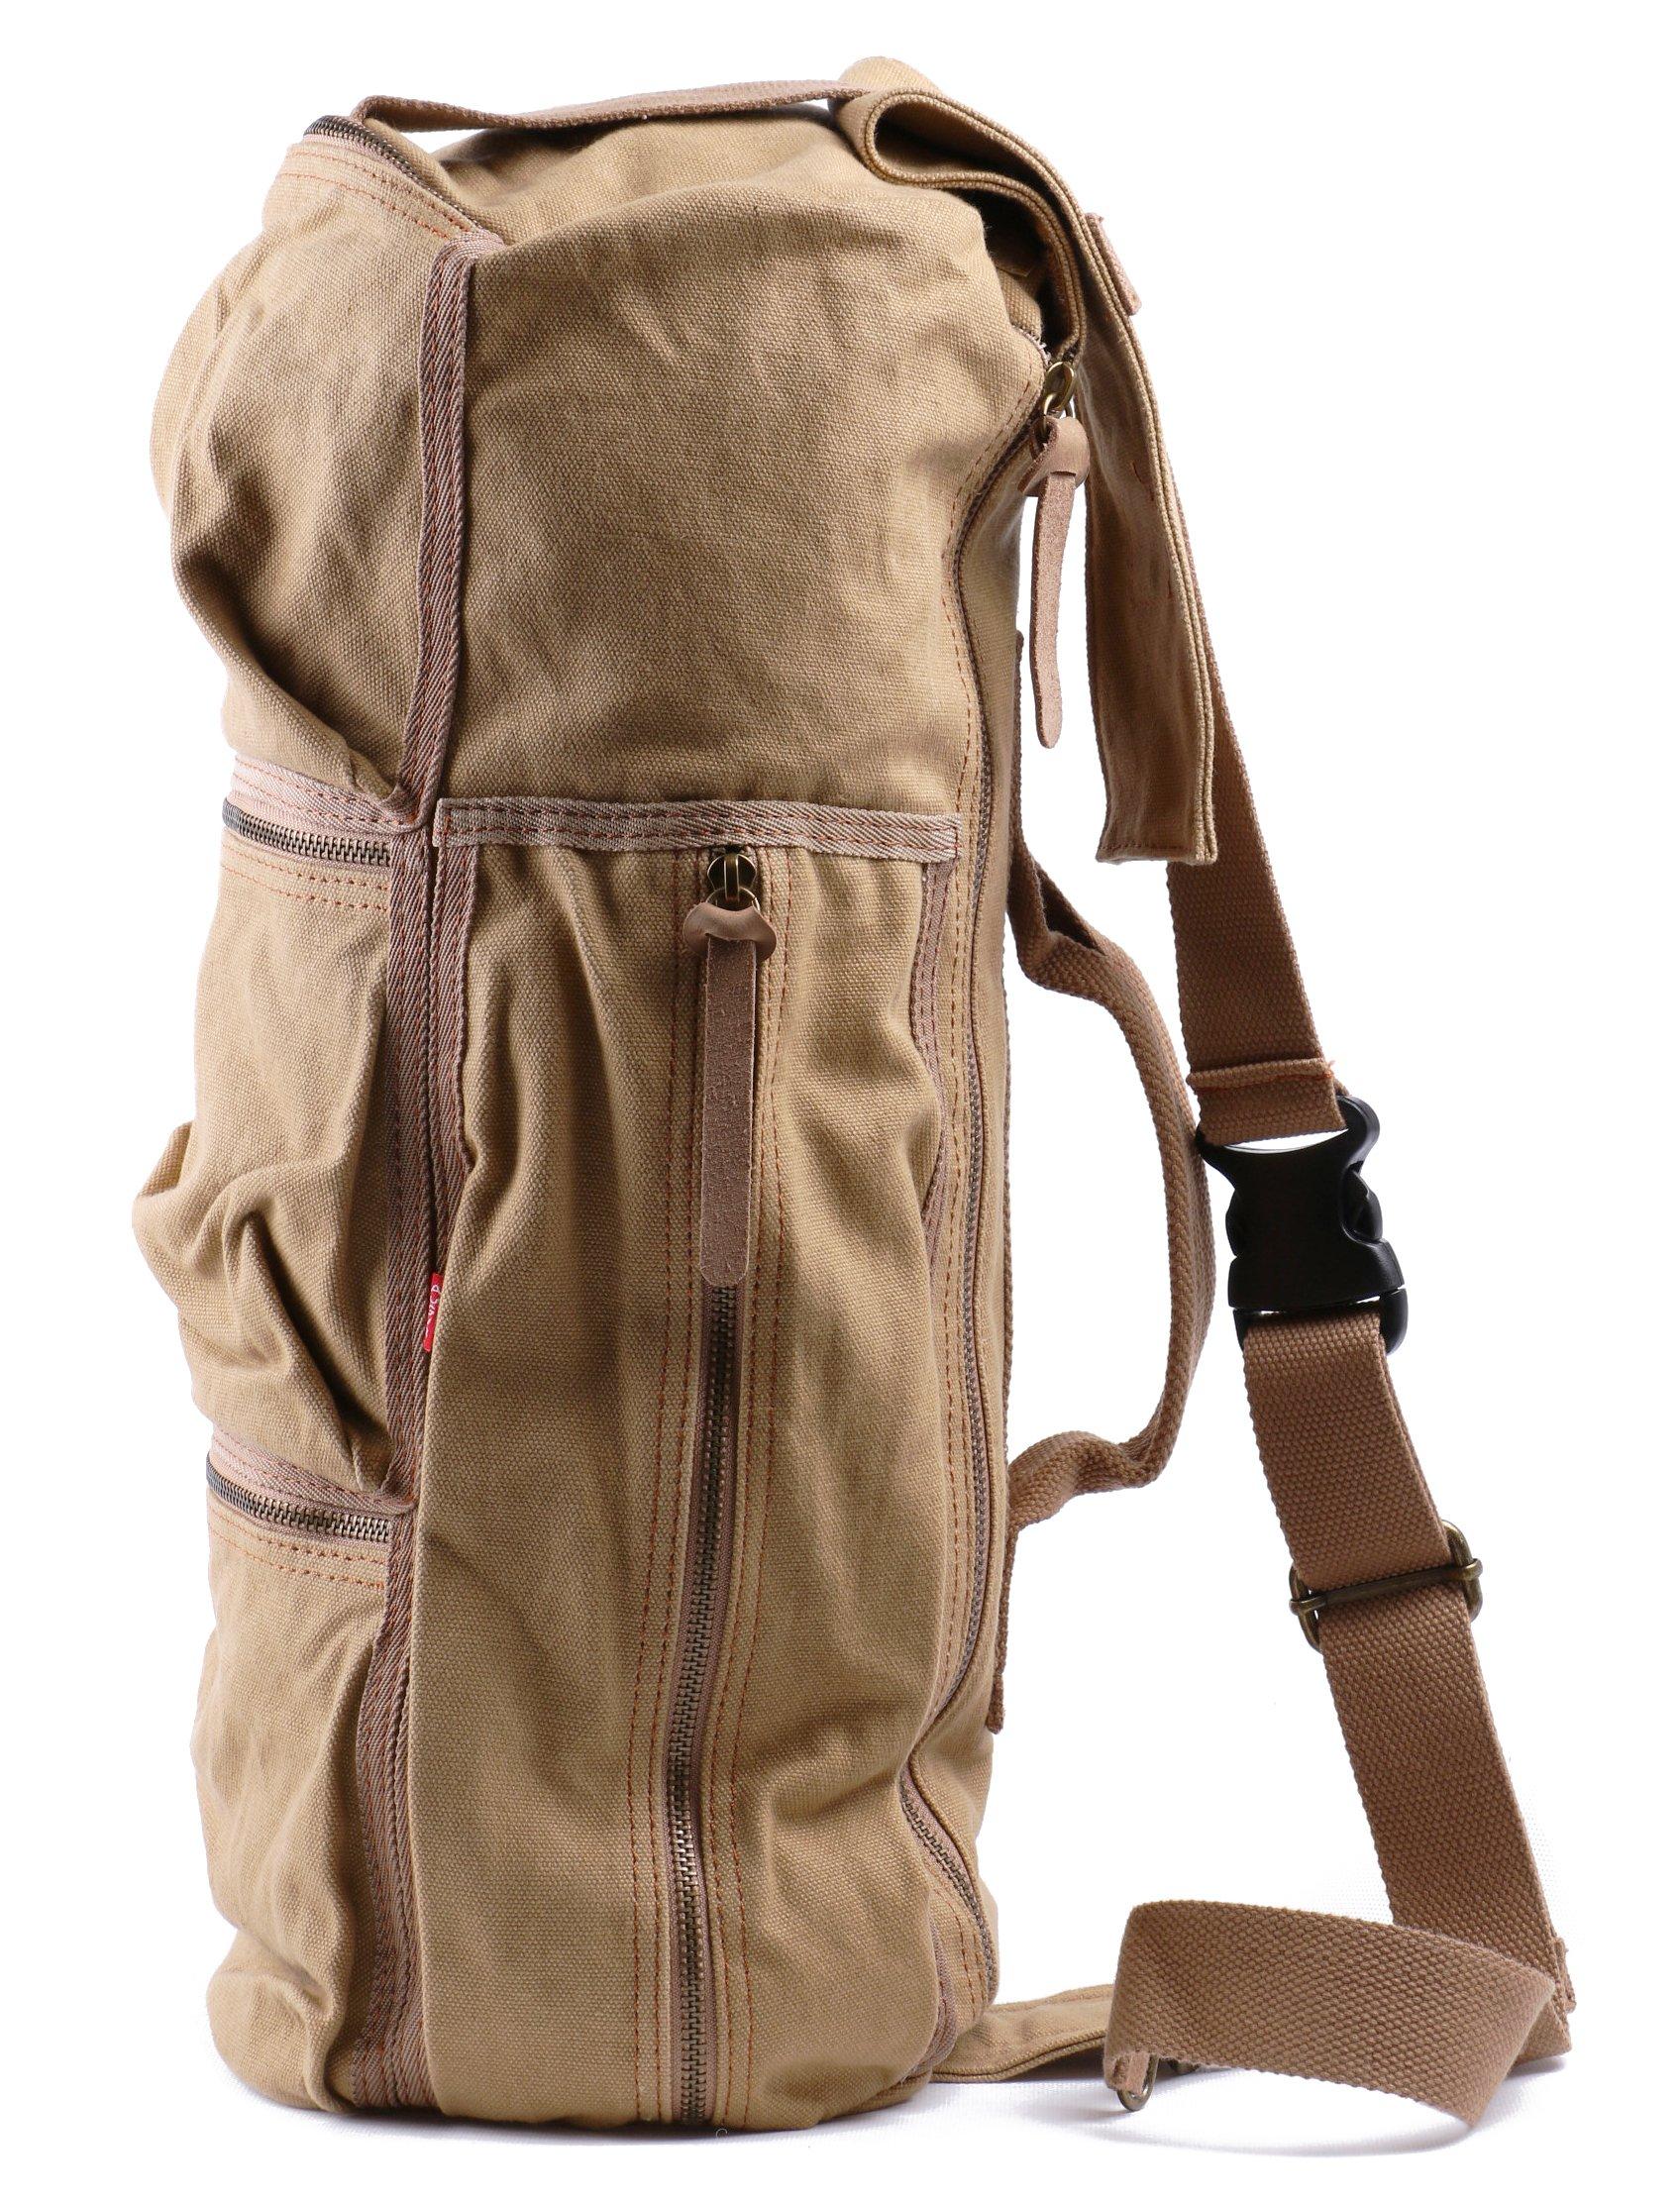 Cylinder Canvas Bag Travel Outdoor Hiking Bag Luggage Satchel Bag Should Bags(Khaki)